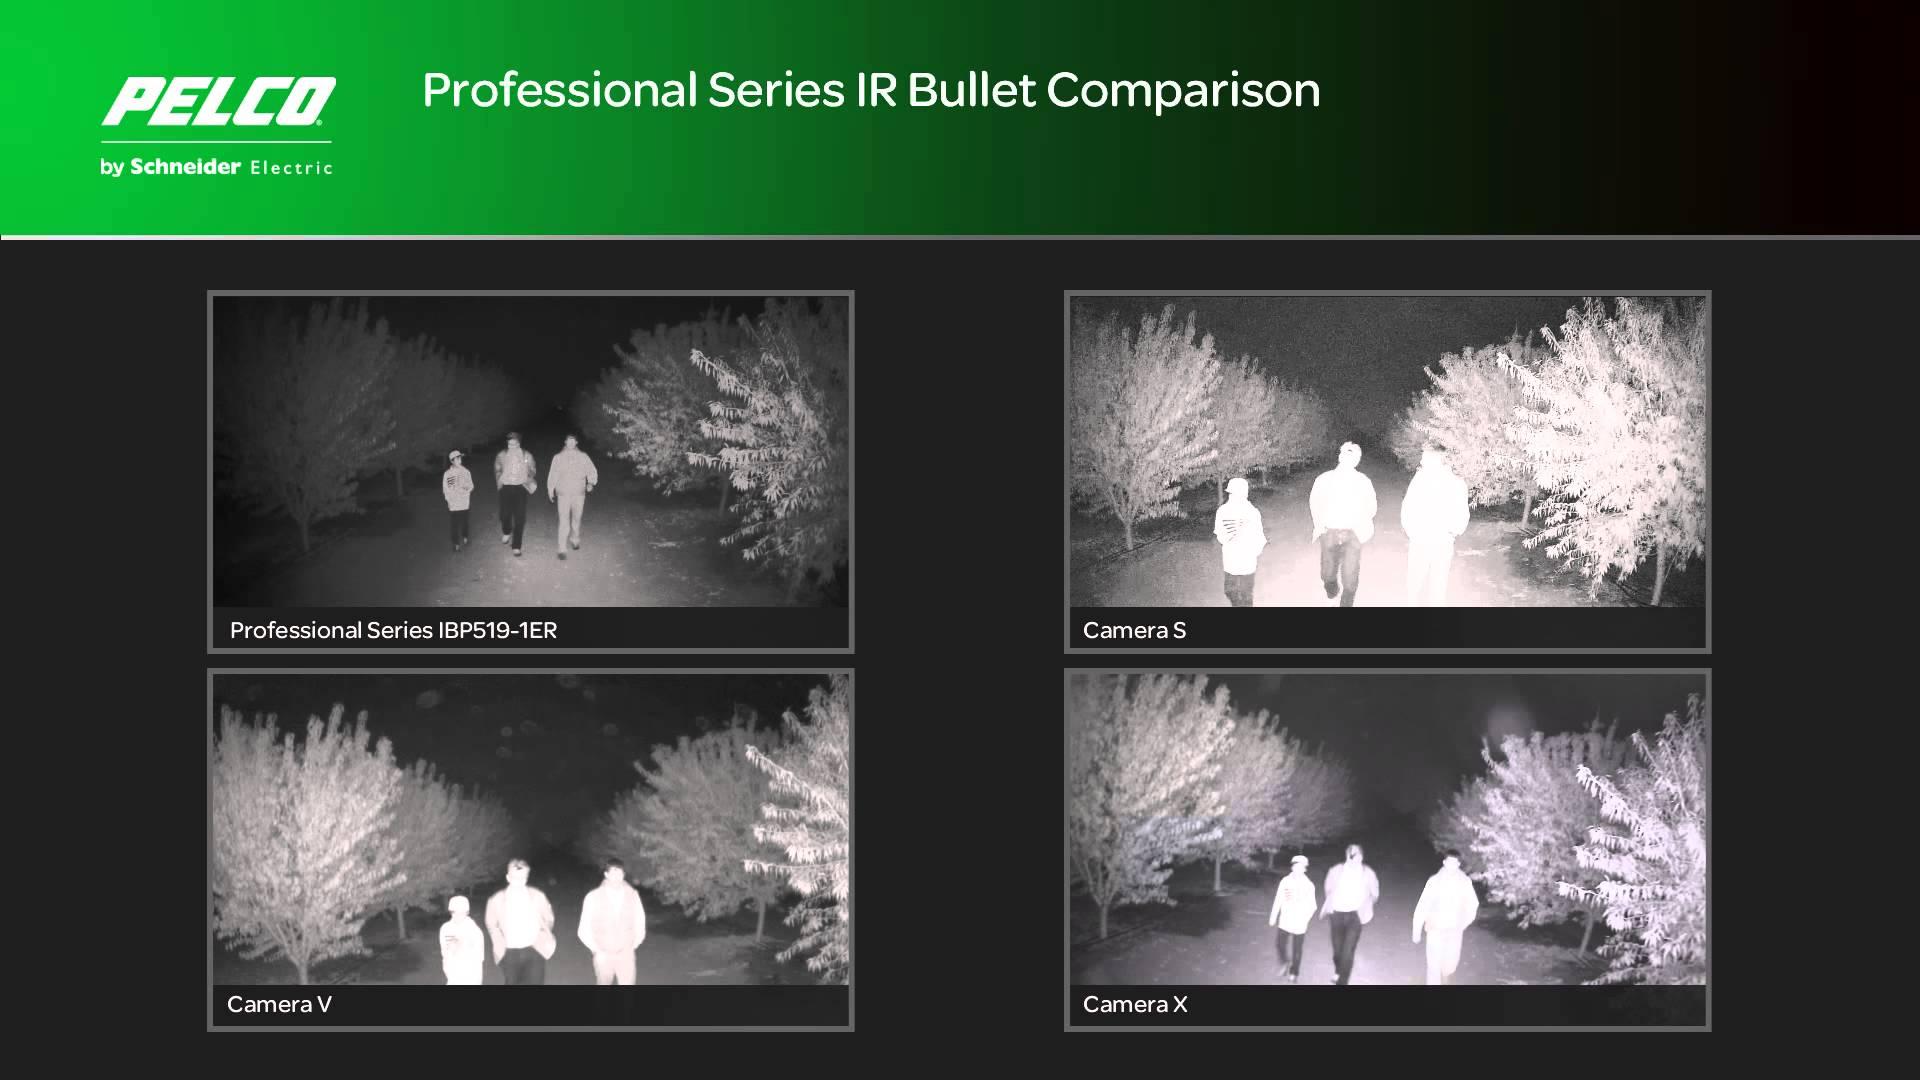 Sarix Professional Adaptive IR Comparison - Night Time Orchard